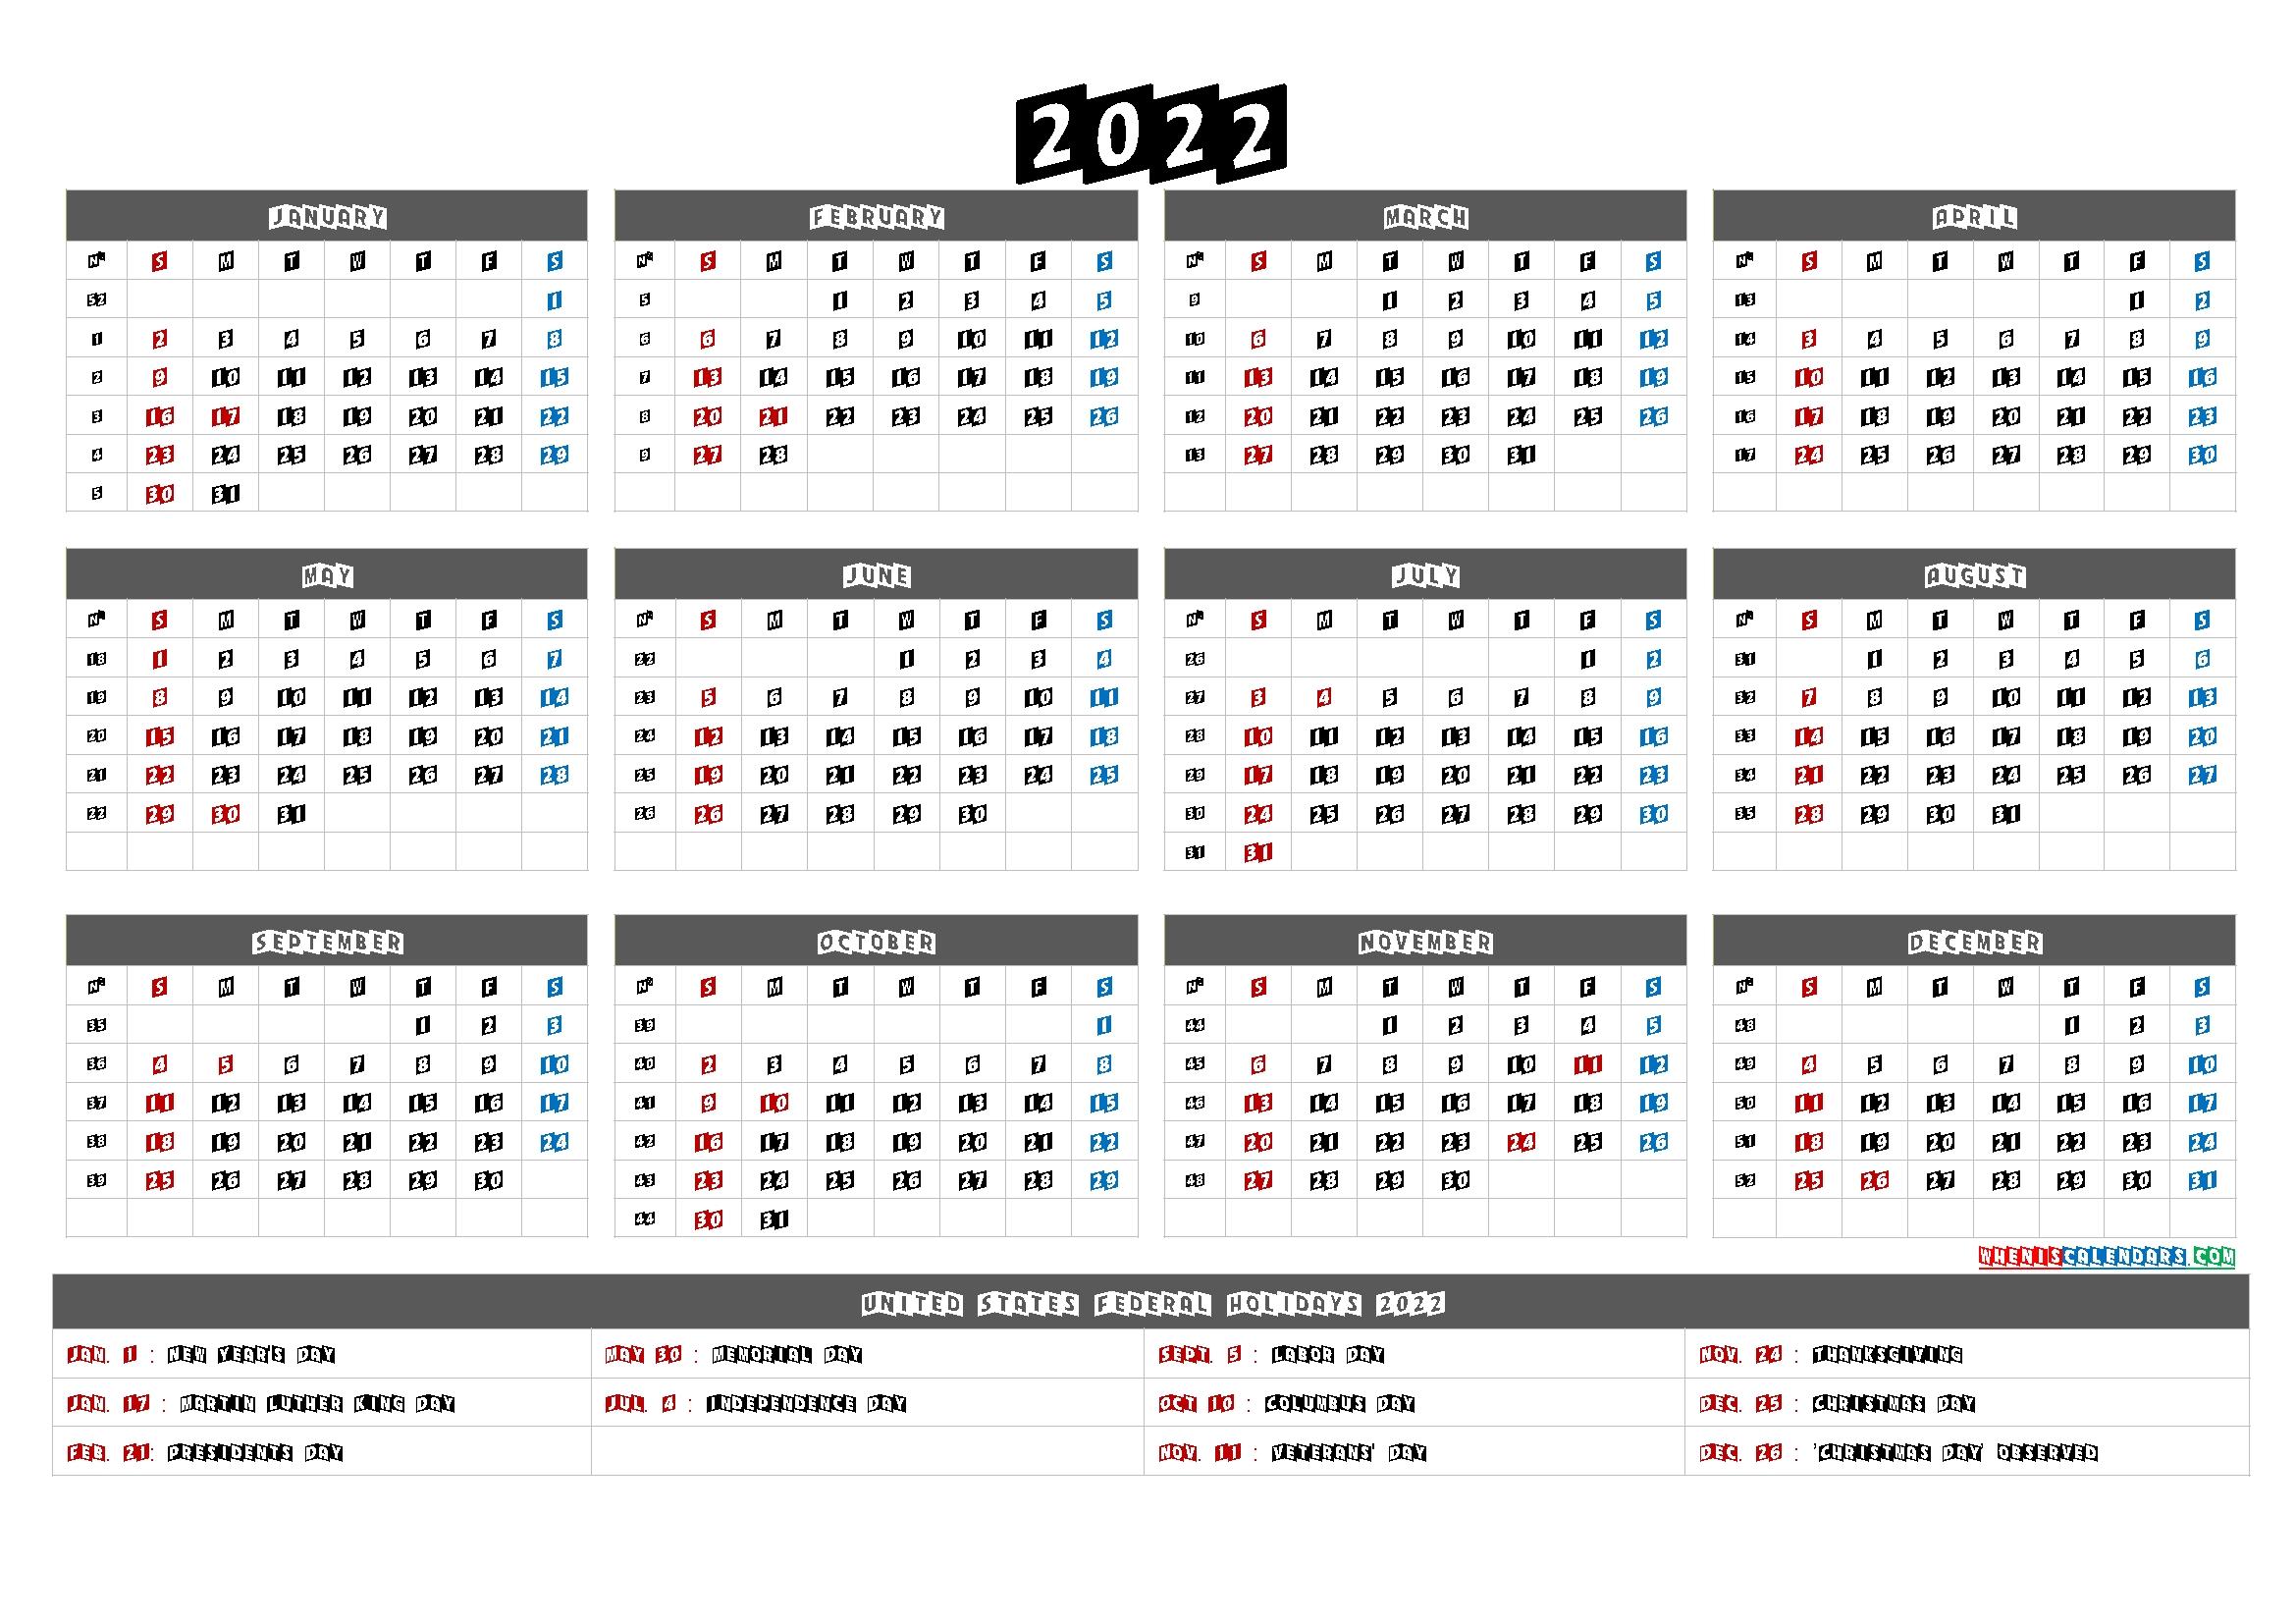 20+ Calendar For 2022 Printable - Free Download Printable